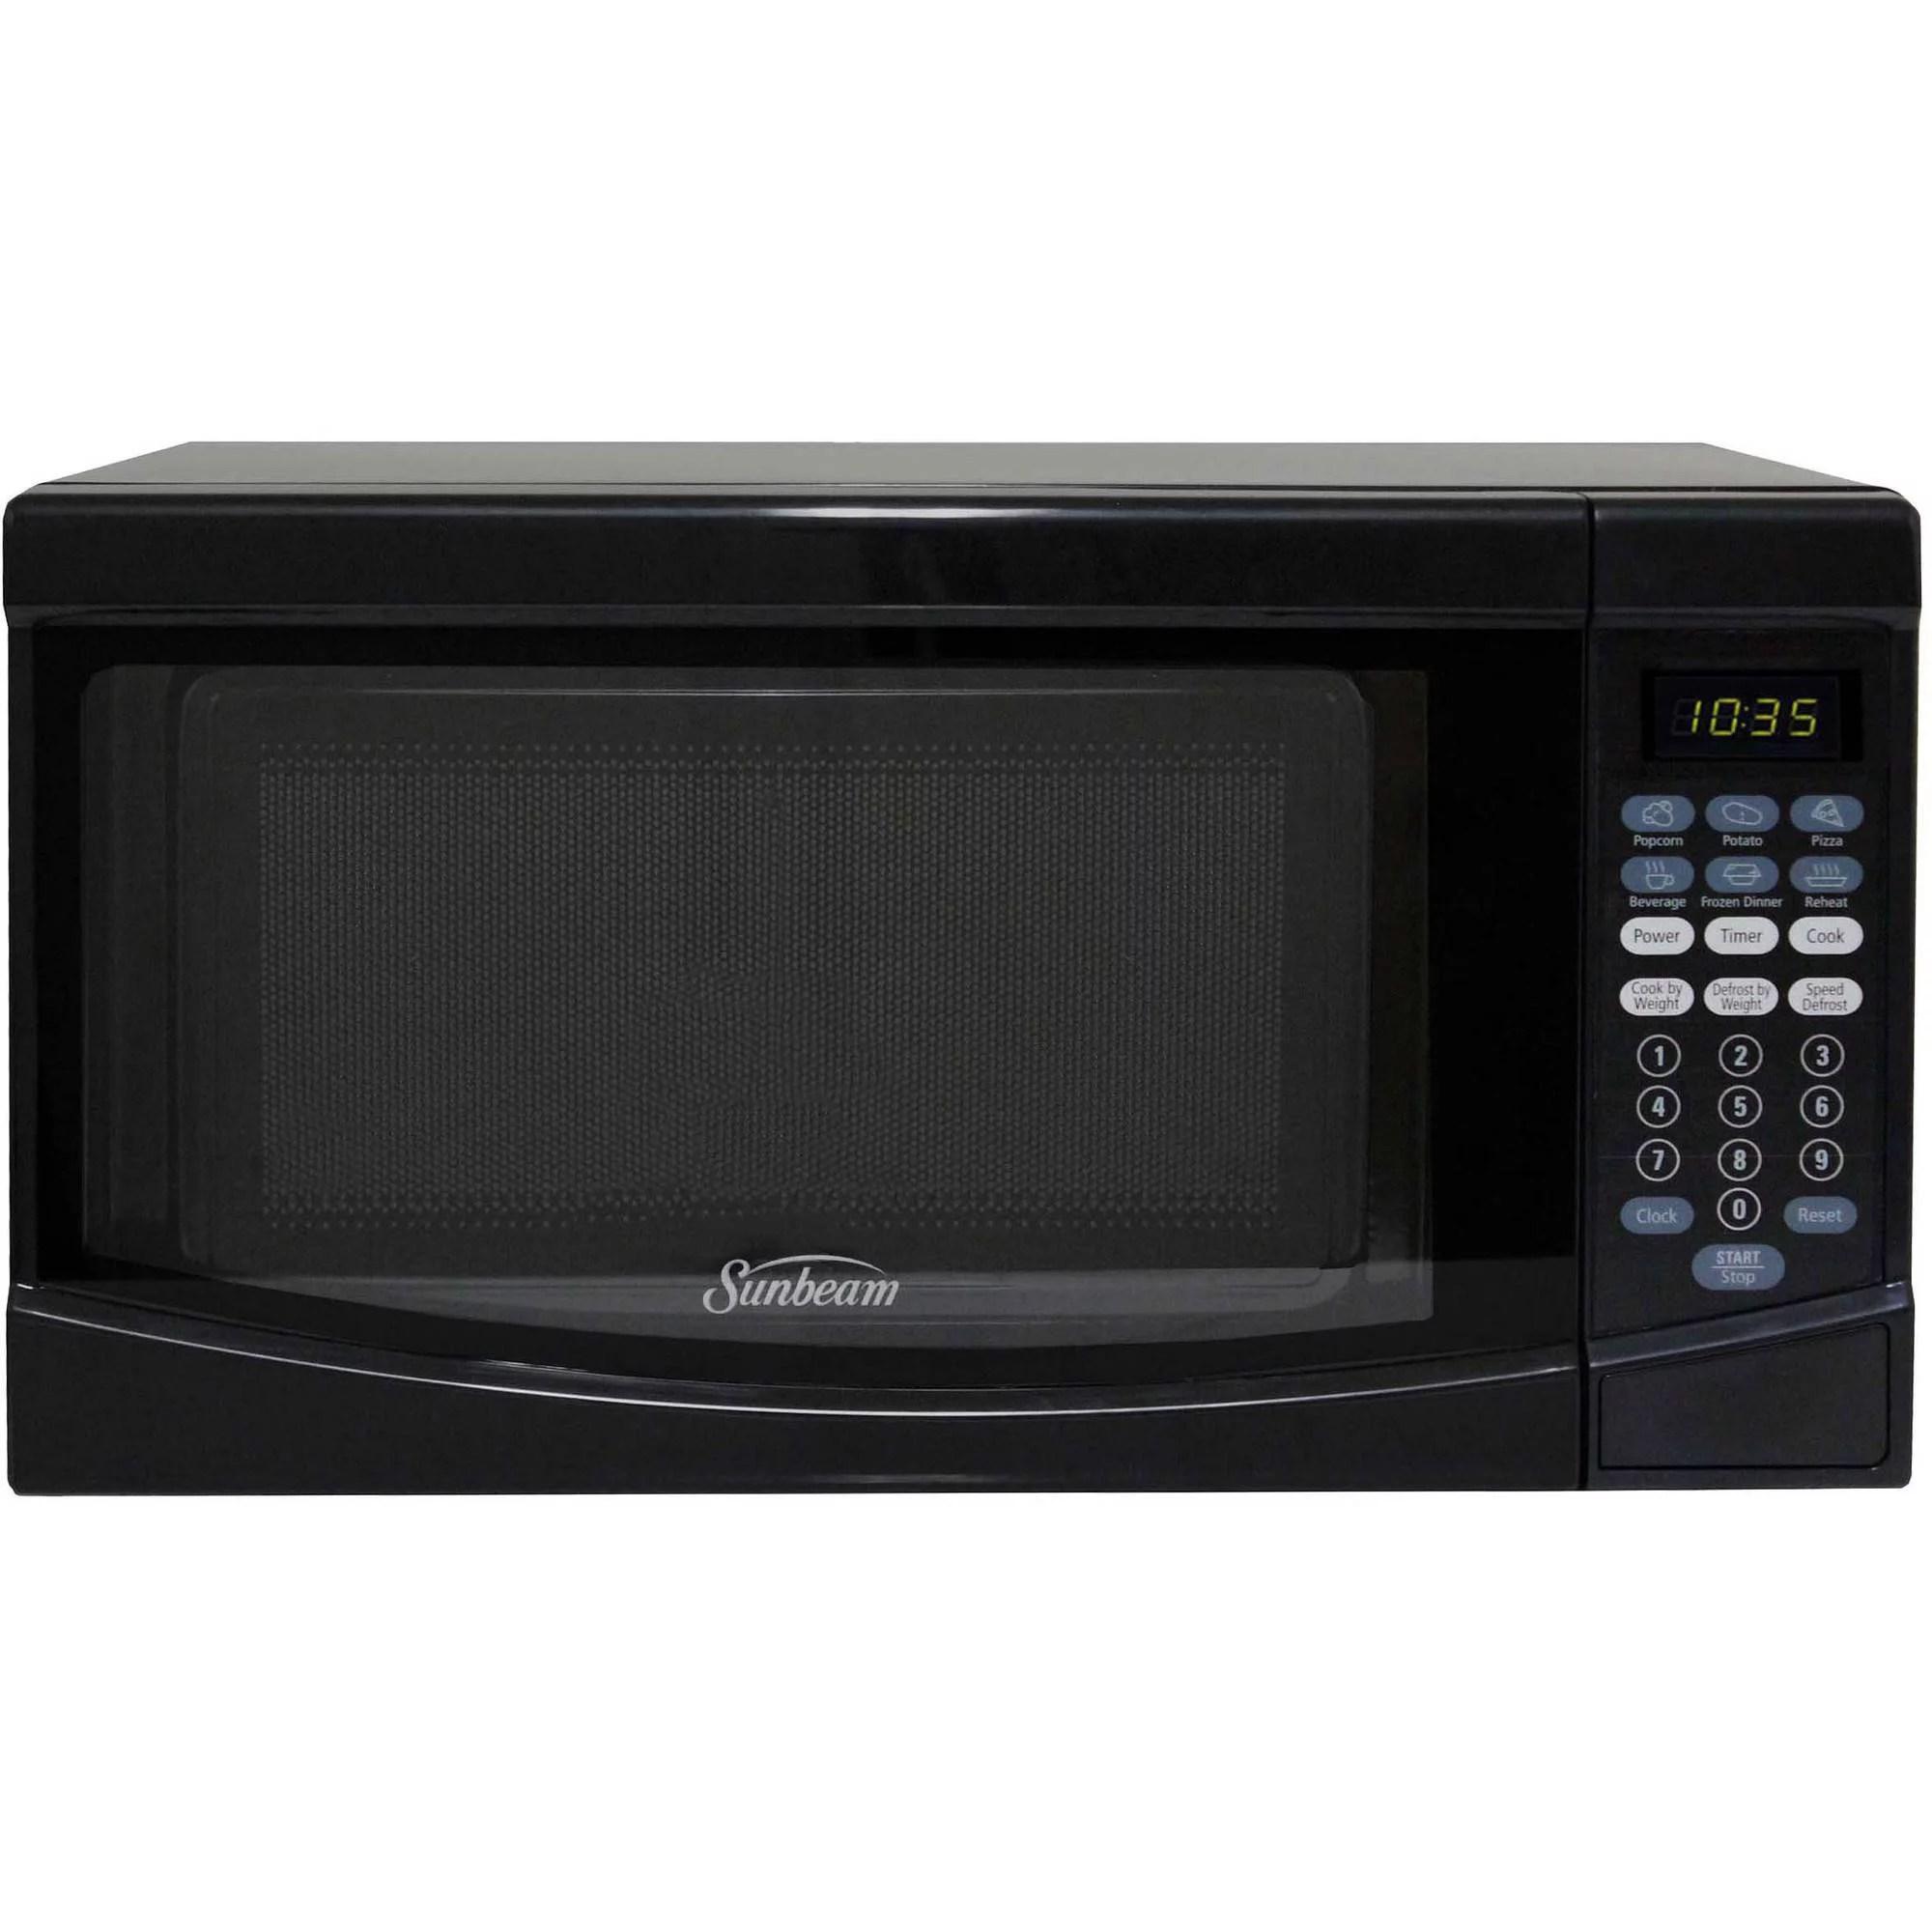 sunbeam 0 7 cuft 700 watt microwave oven sgke702 black